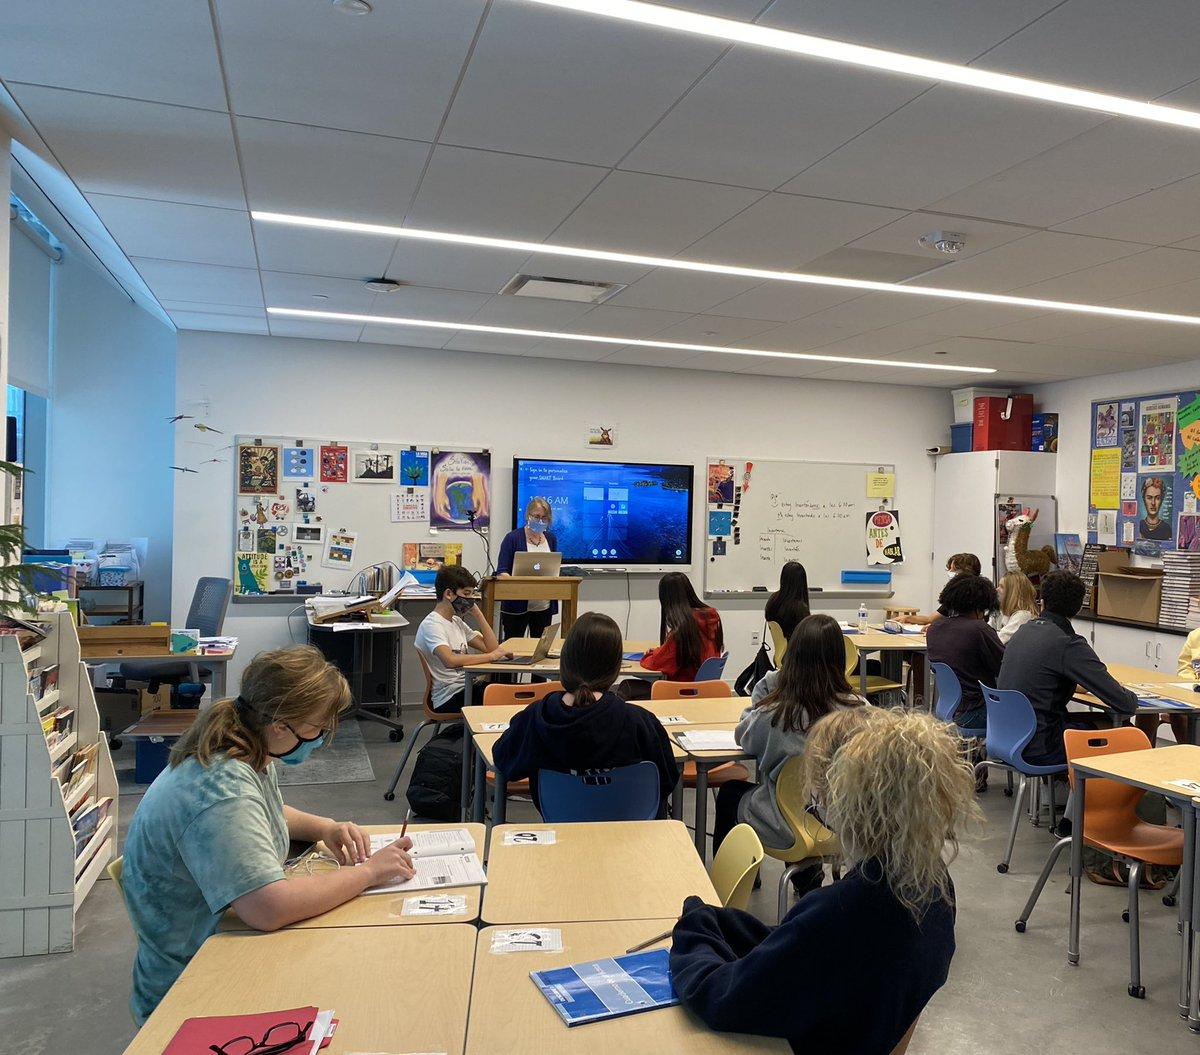 #SchoolVisits學習世界語言@hbwitc @HBWProgram https://t.co/k0HzXNW5Fp